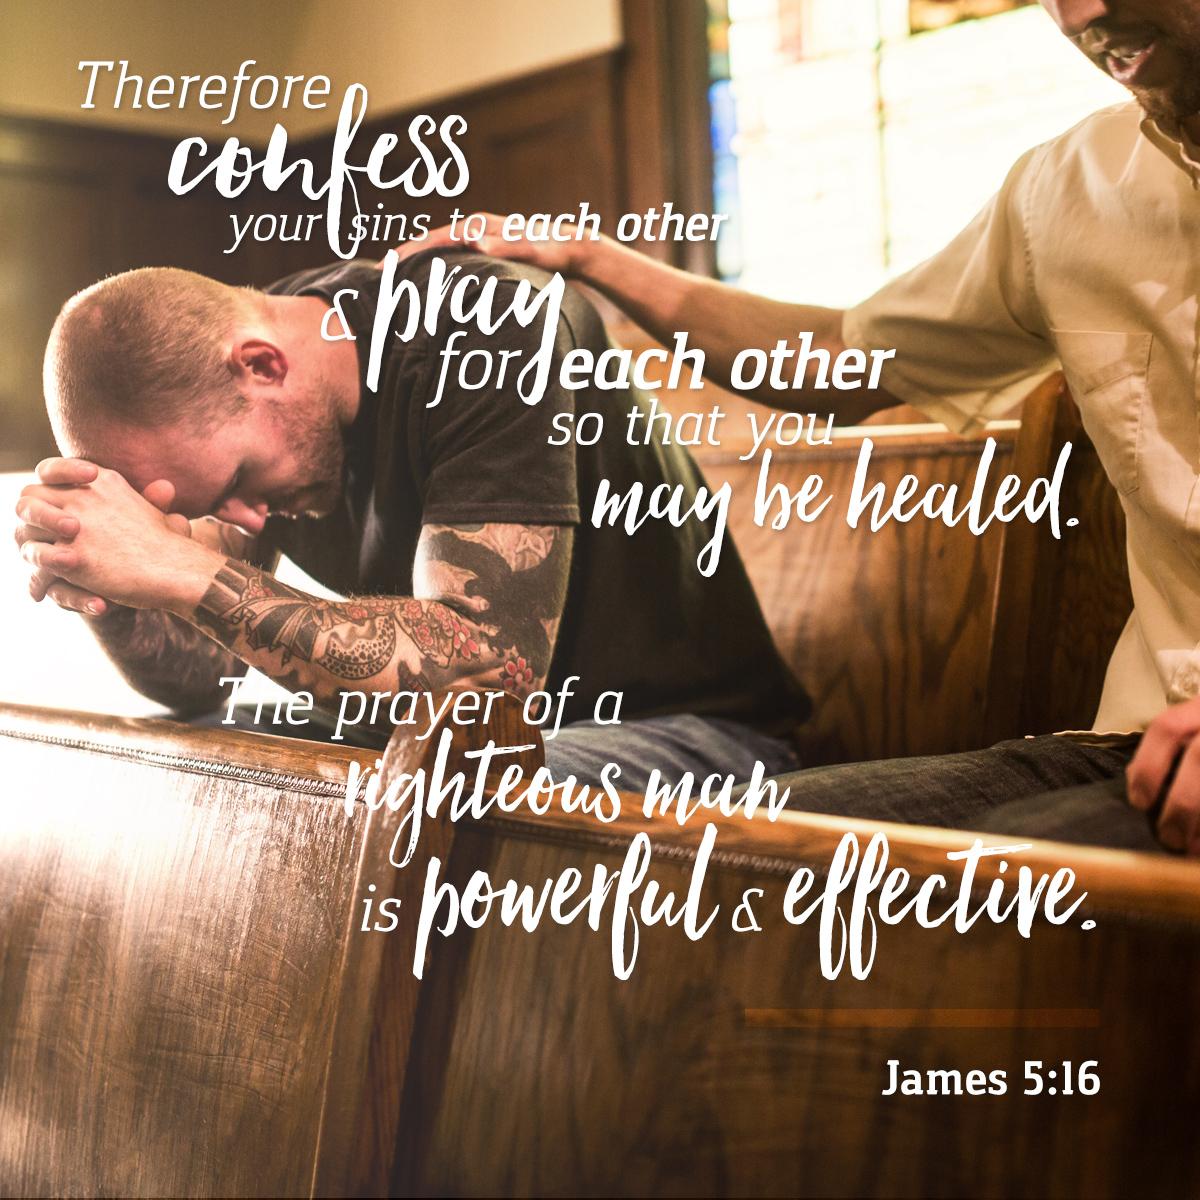 James 5:16 - Daily Verse